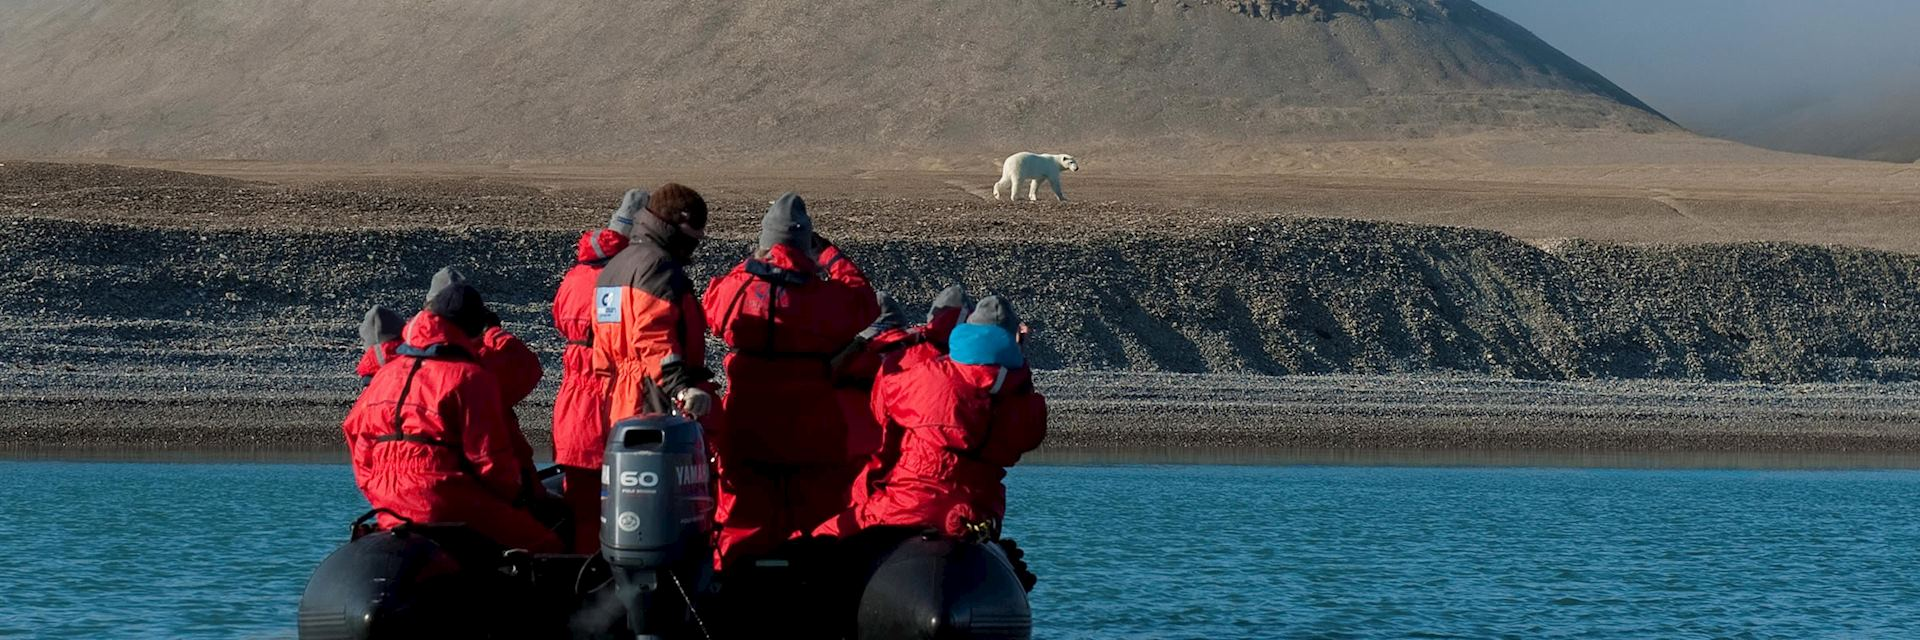 Polar bear, Northwest Passage, Canada